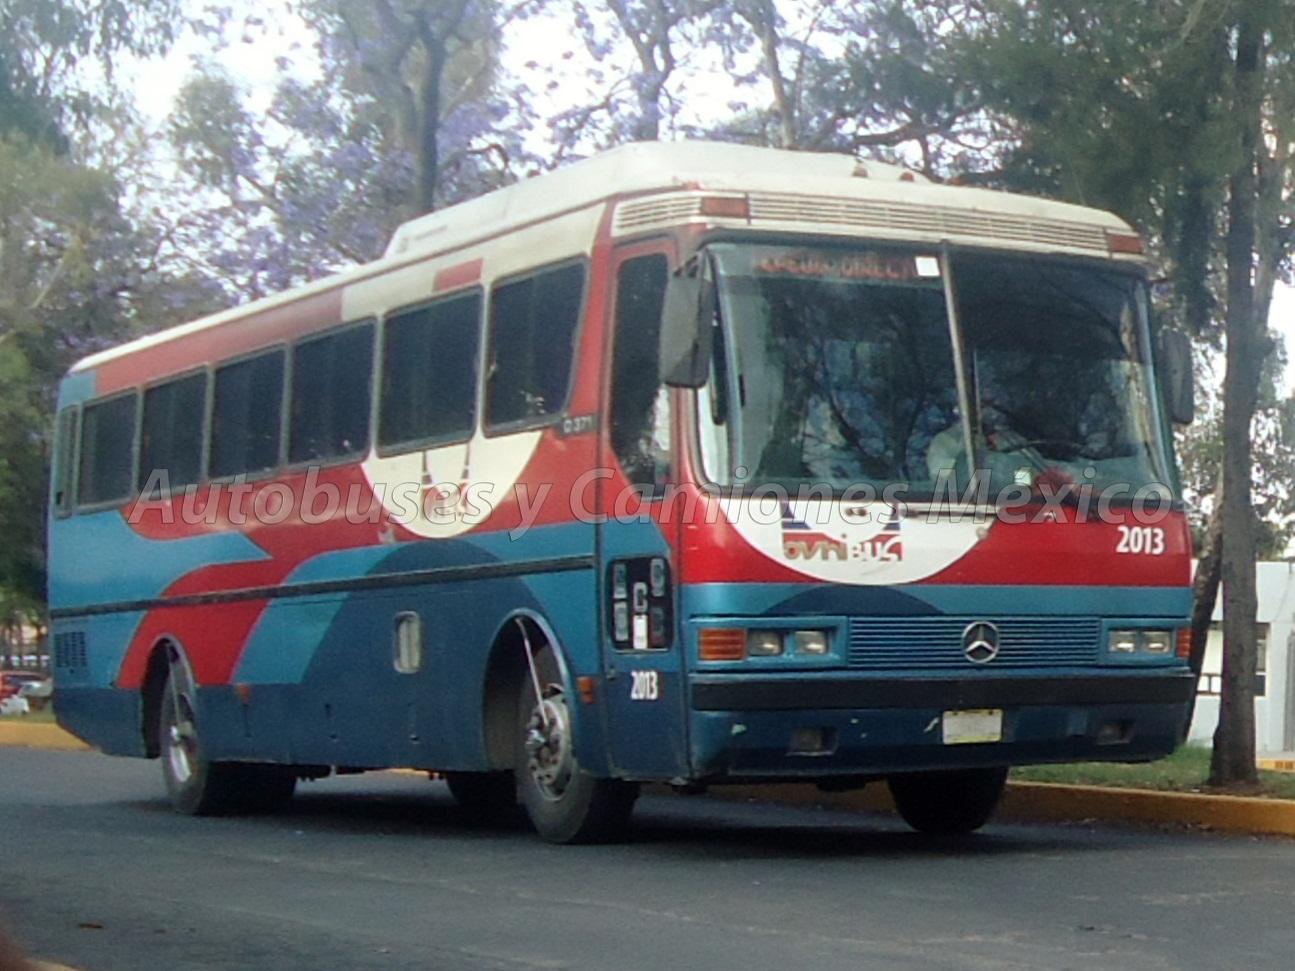 Aycamx autobuses y camiones m xico autobuses for neos for Mercedes benz tijuana